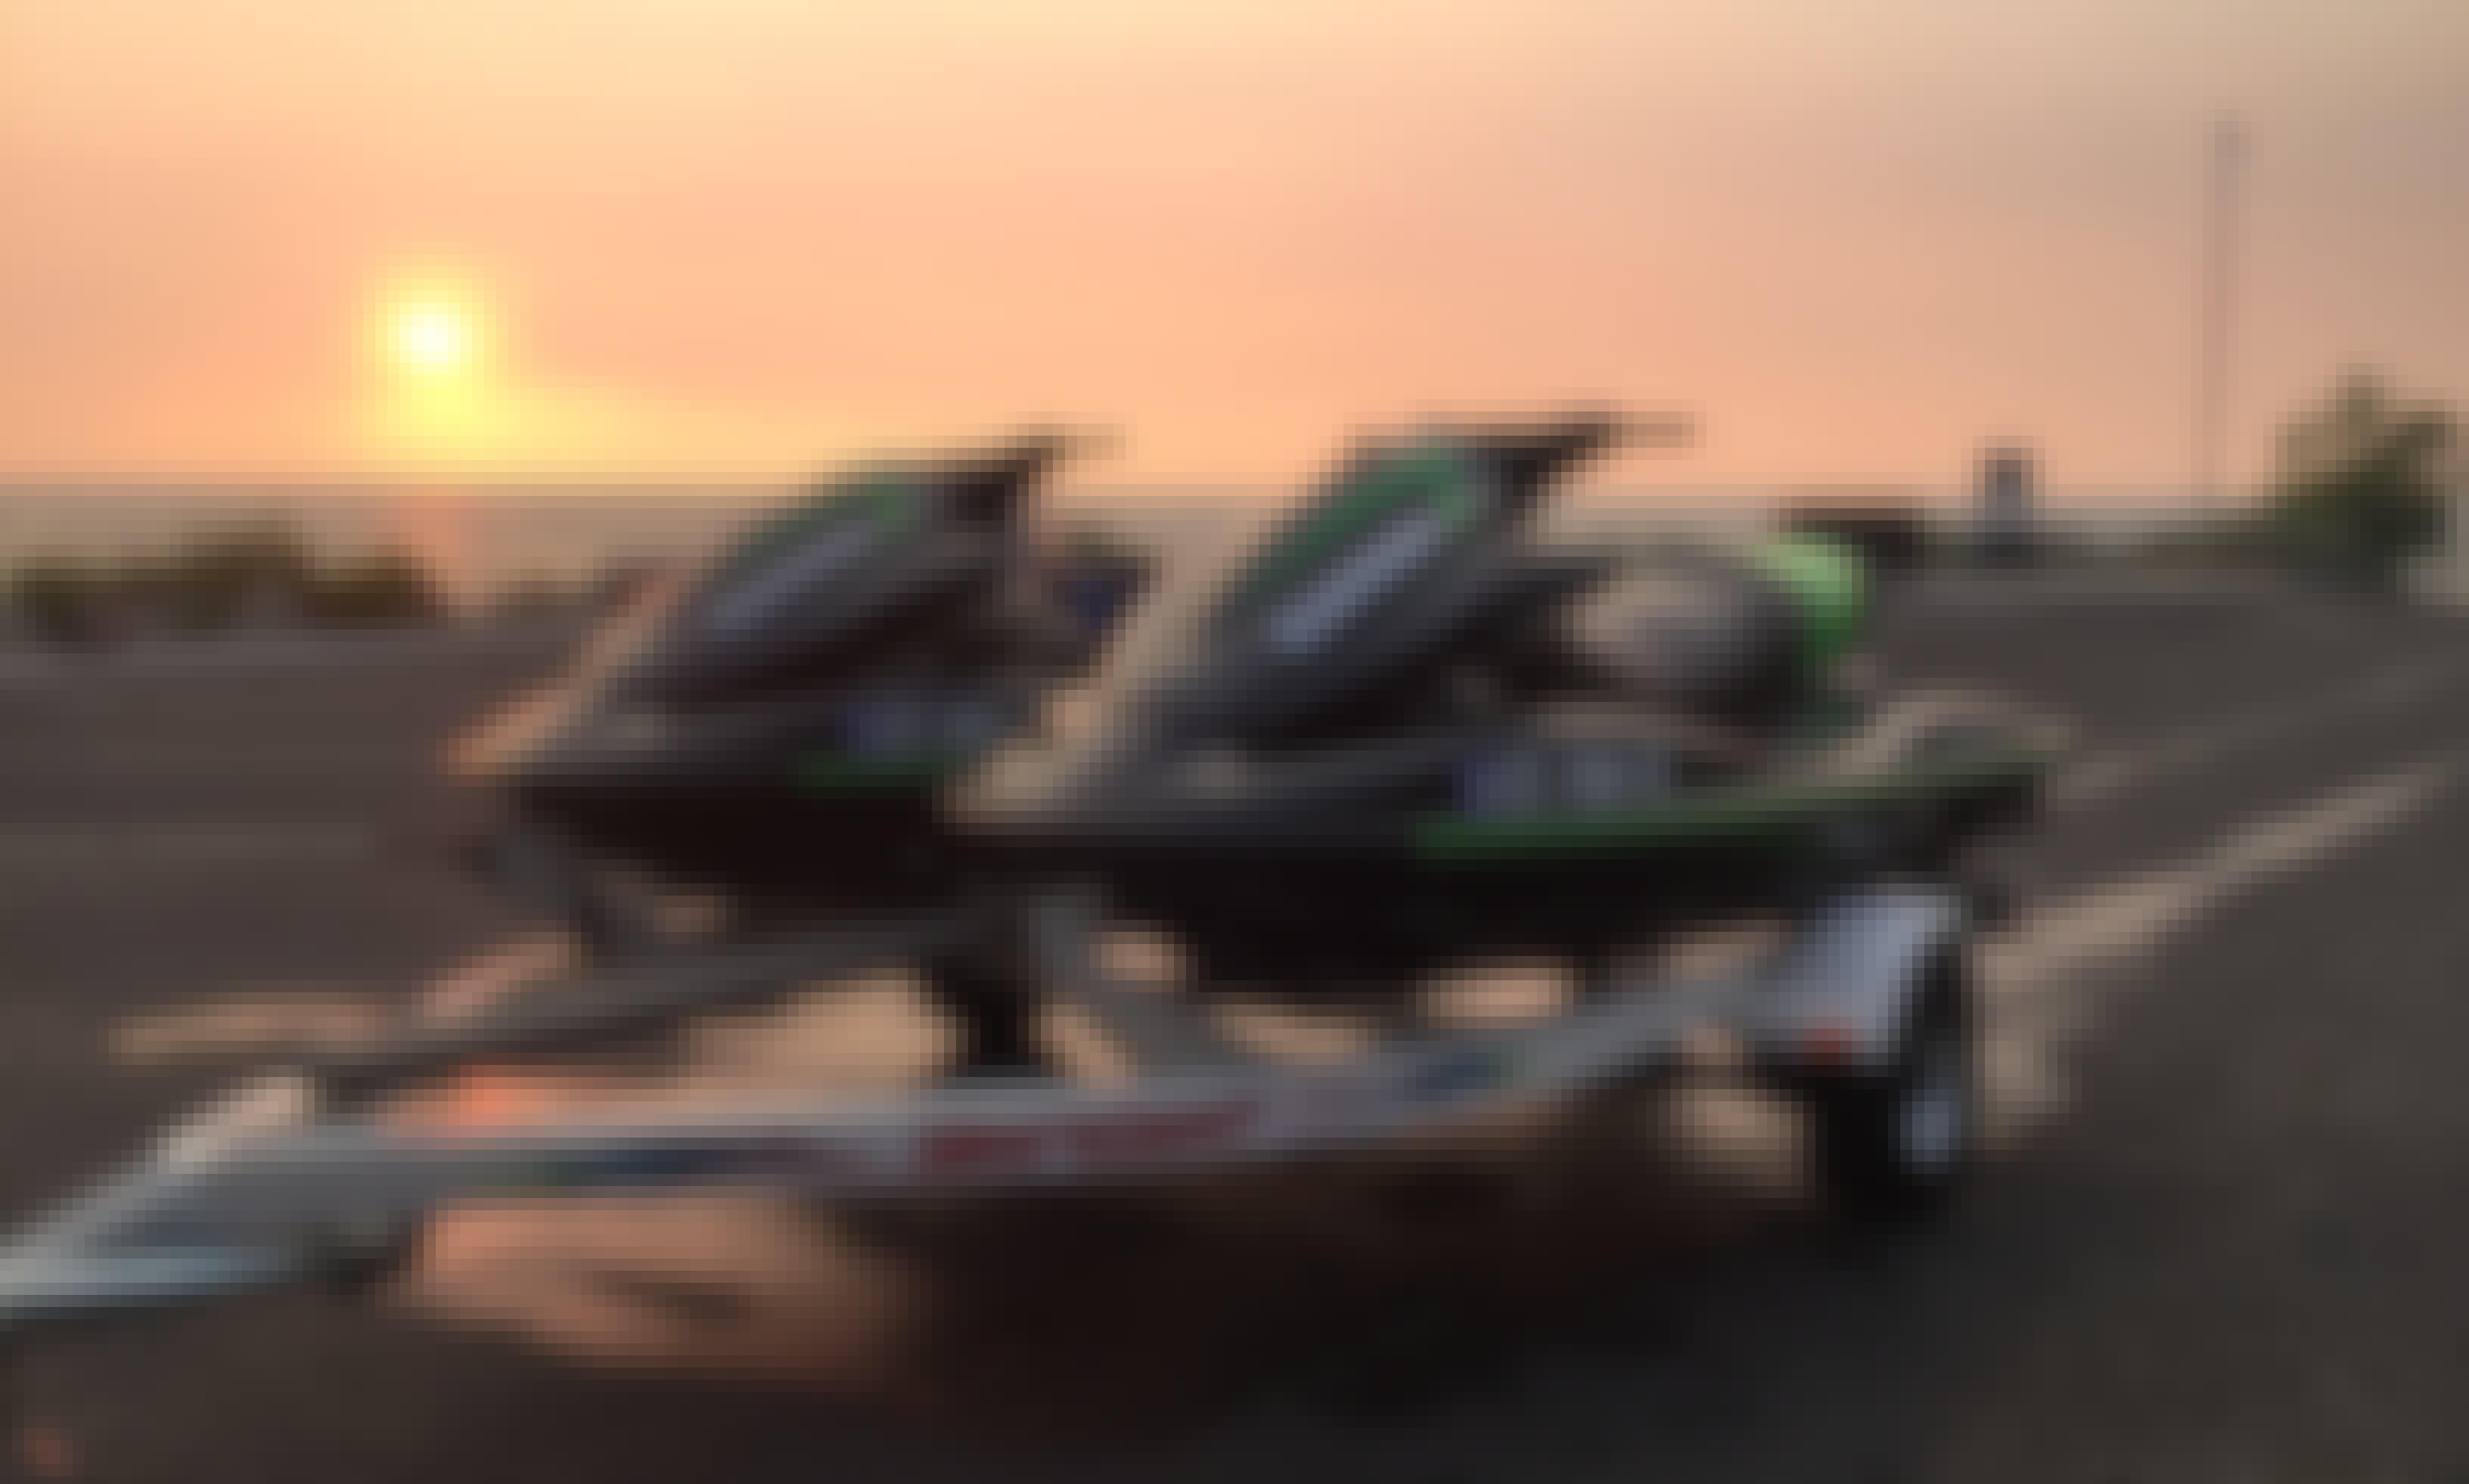 Jet ski rental in South Lake Tahoe